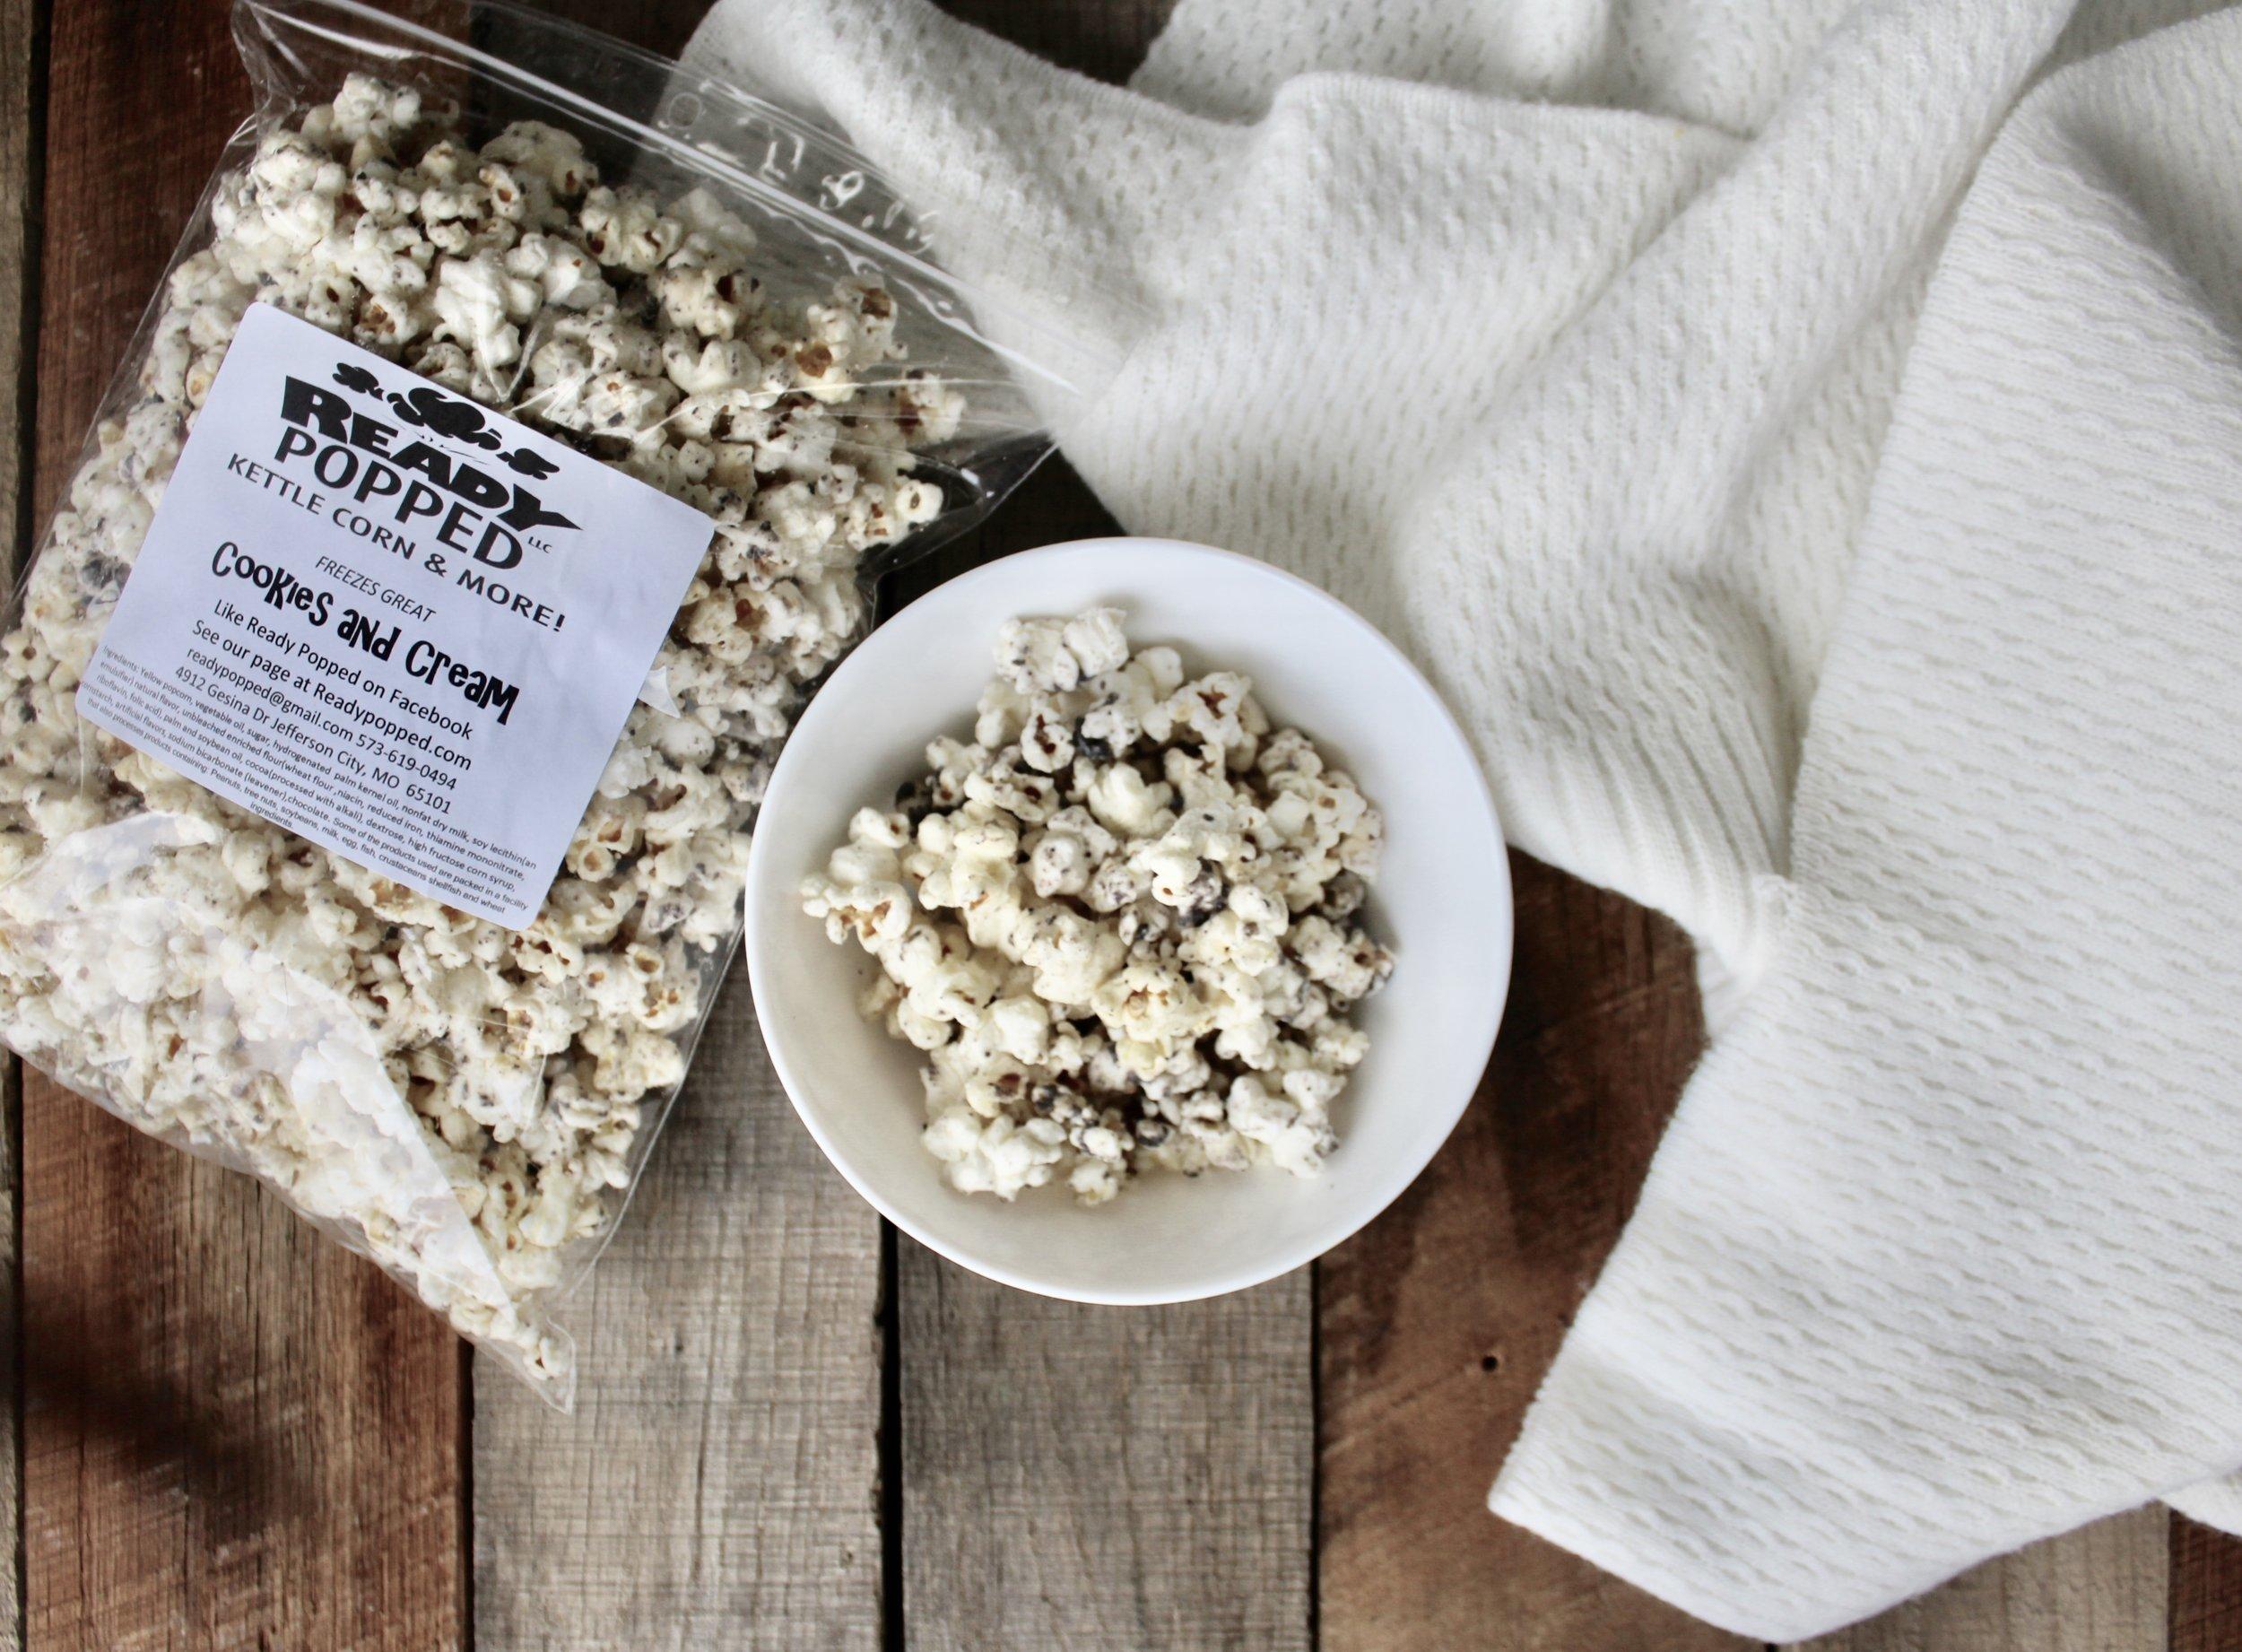 Ready Popped Gourmet Popcorn